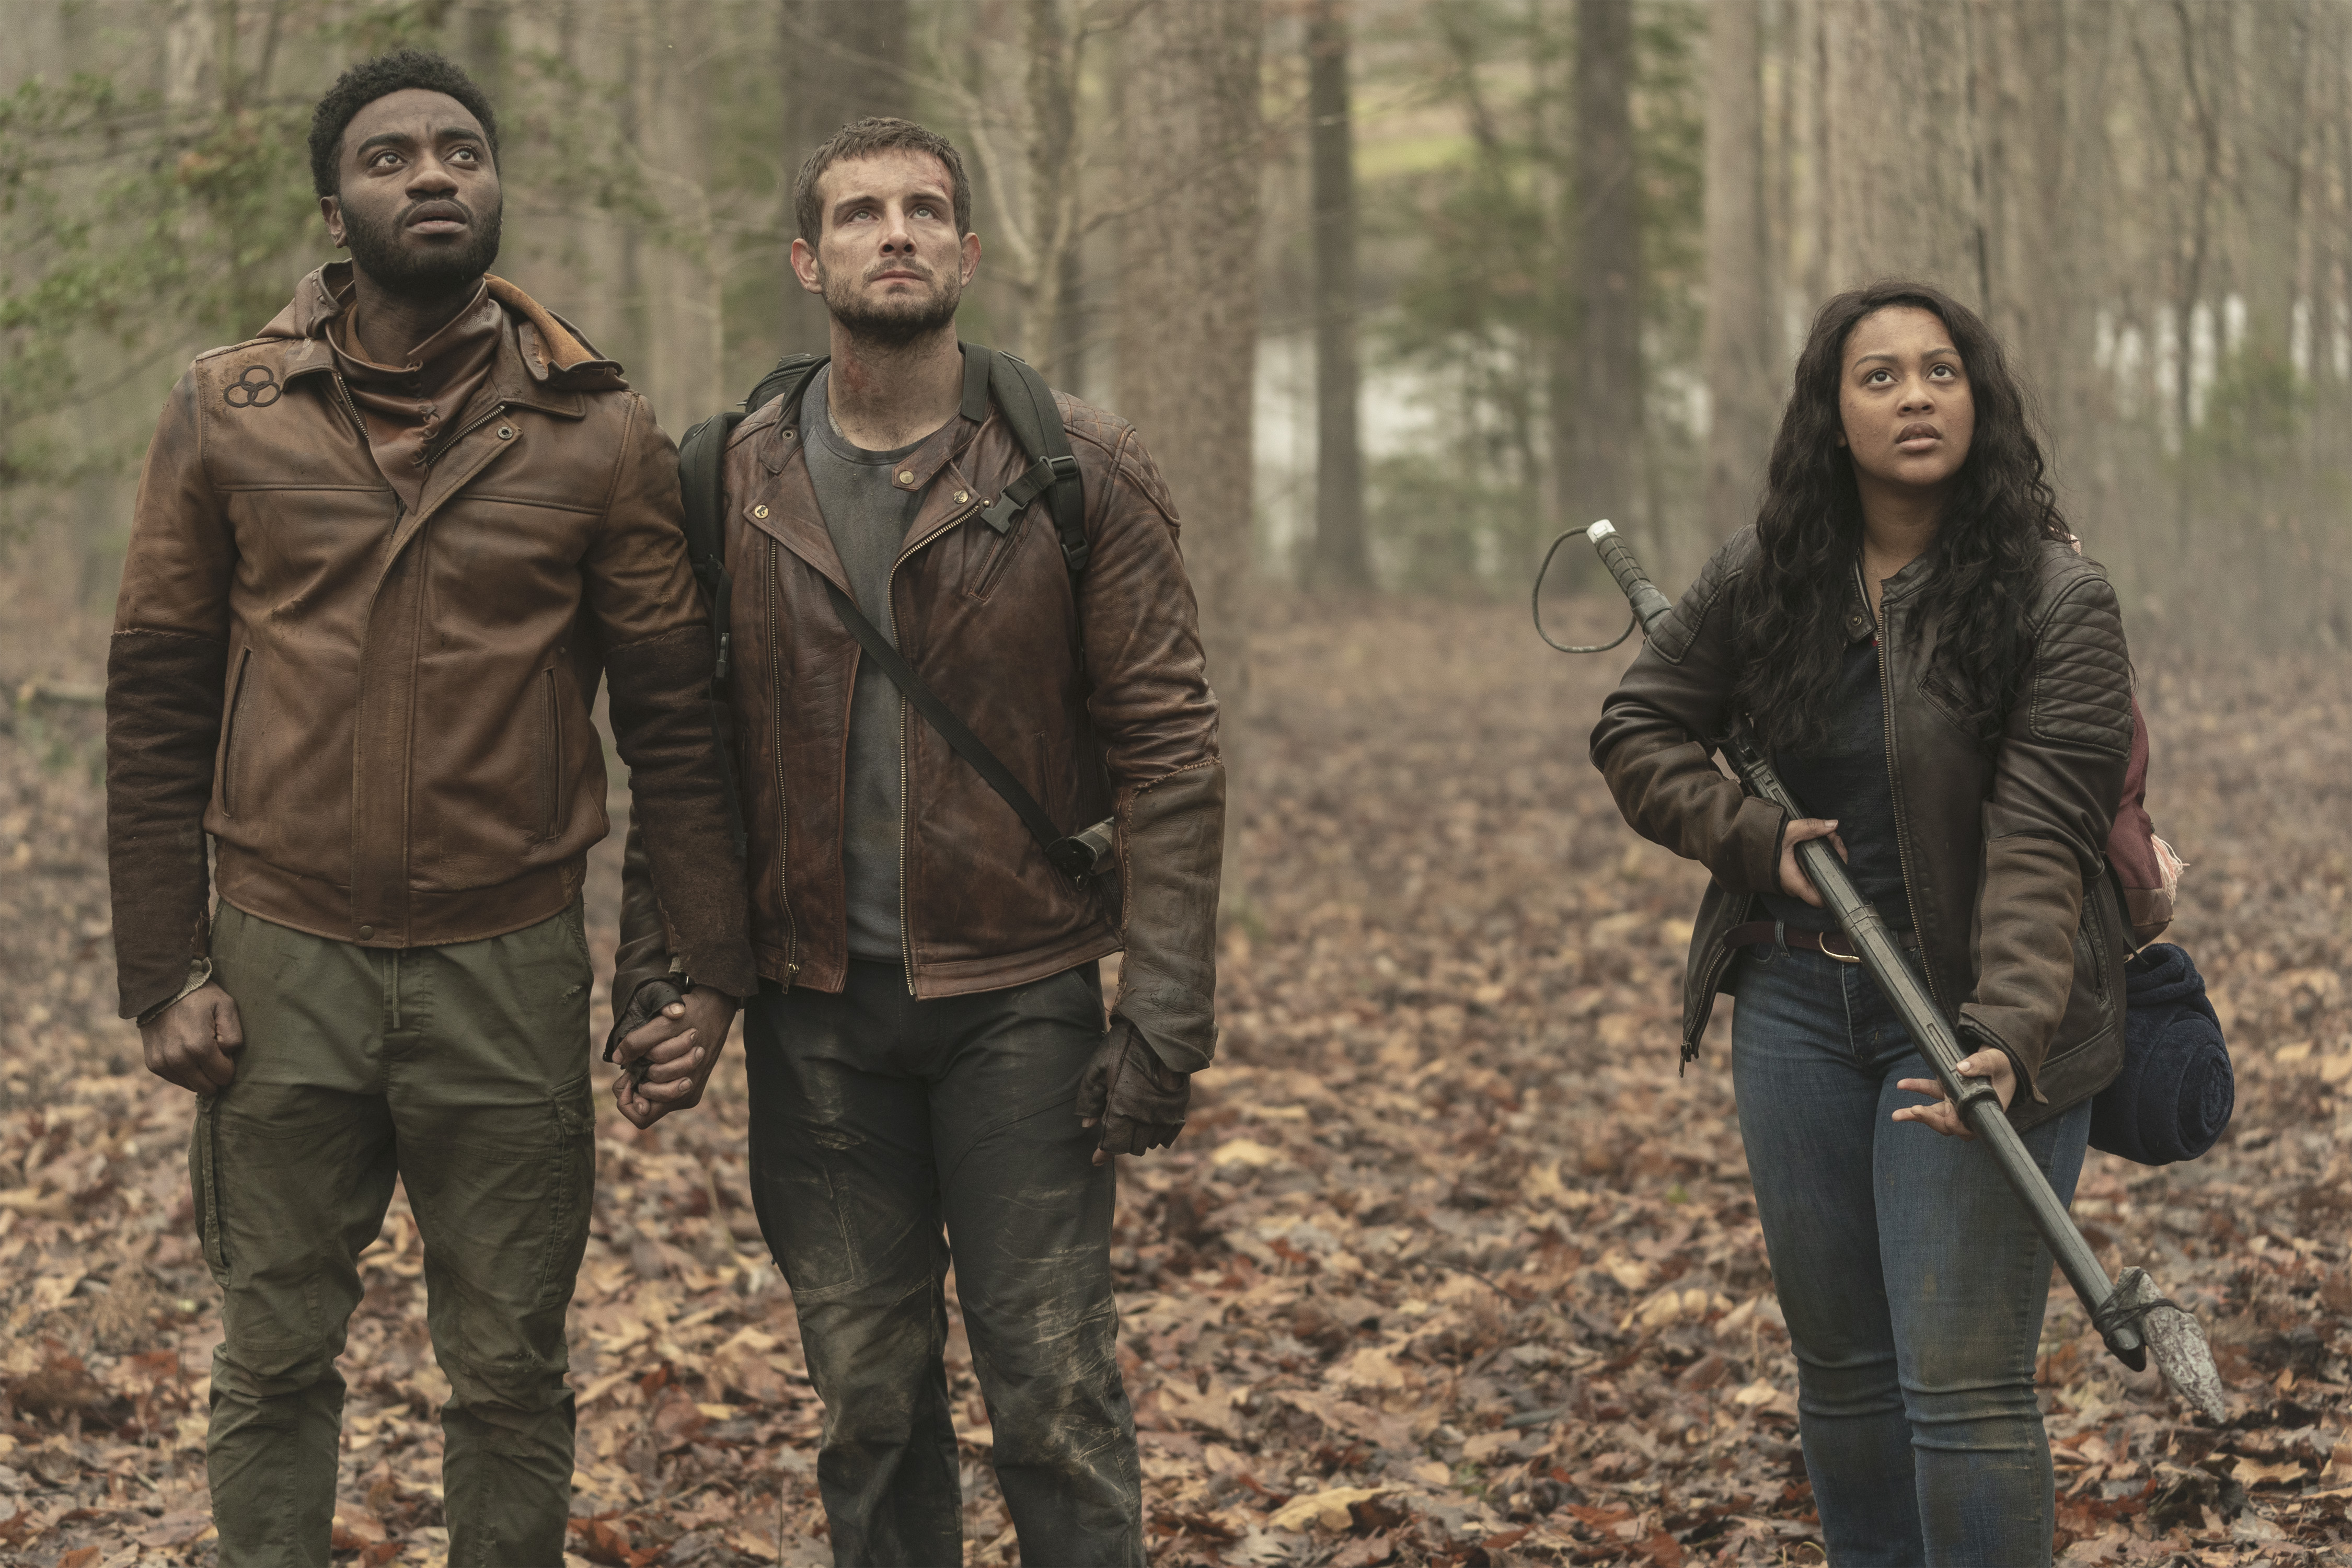 Nico Tortorella as Felix, Aliyah Royale as Iris, Jelani Alladin as Will - The Walking Dead: World Beyond